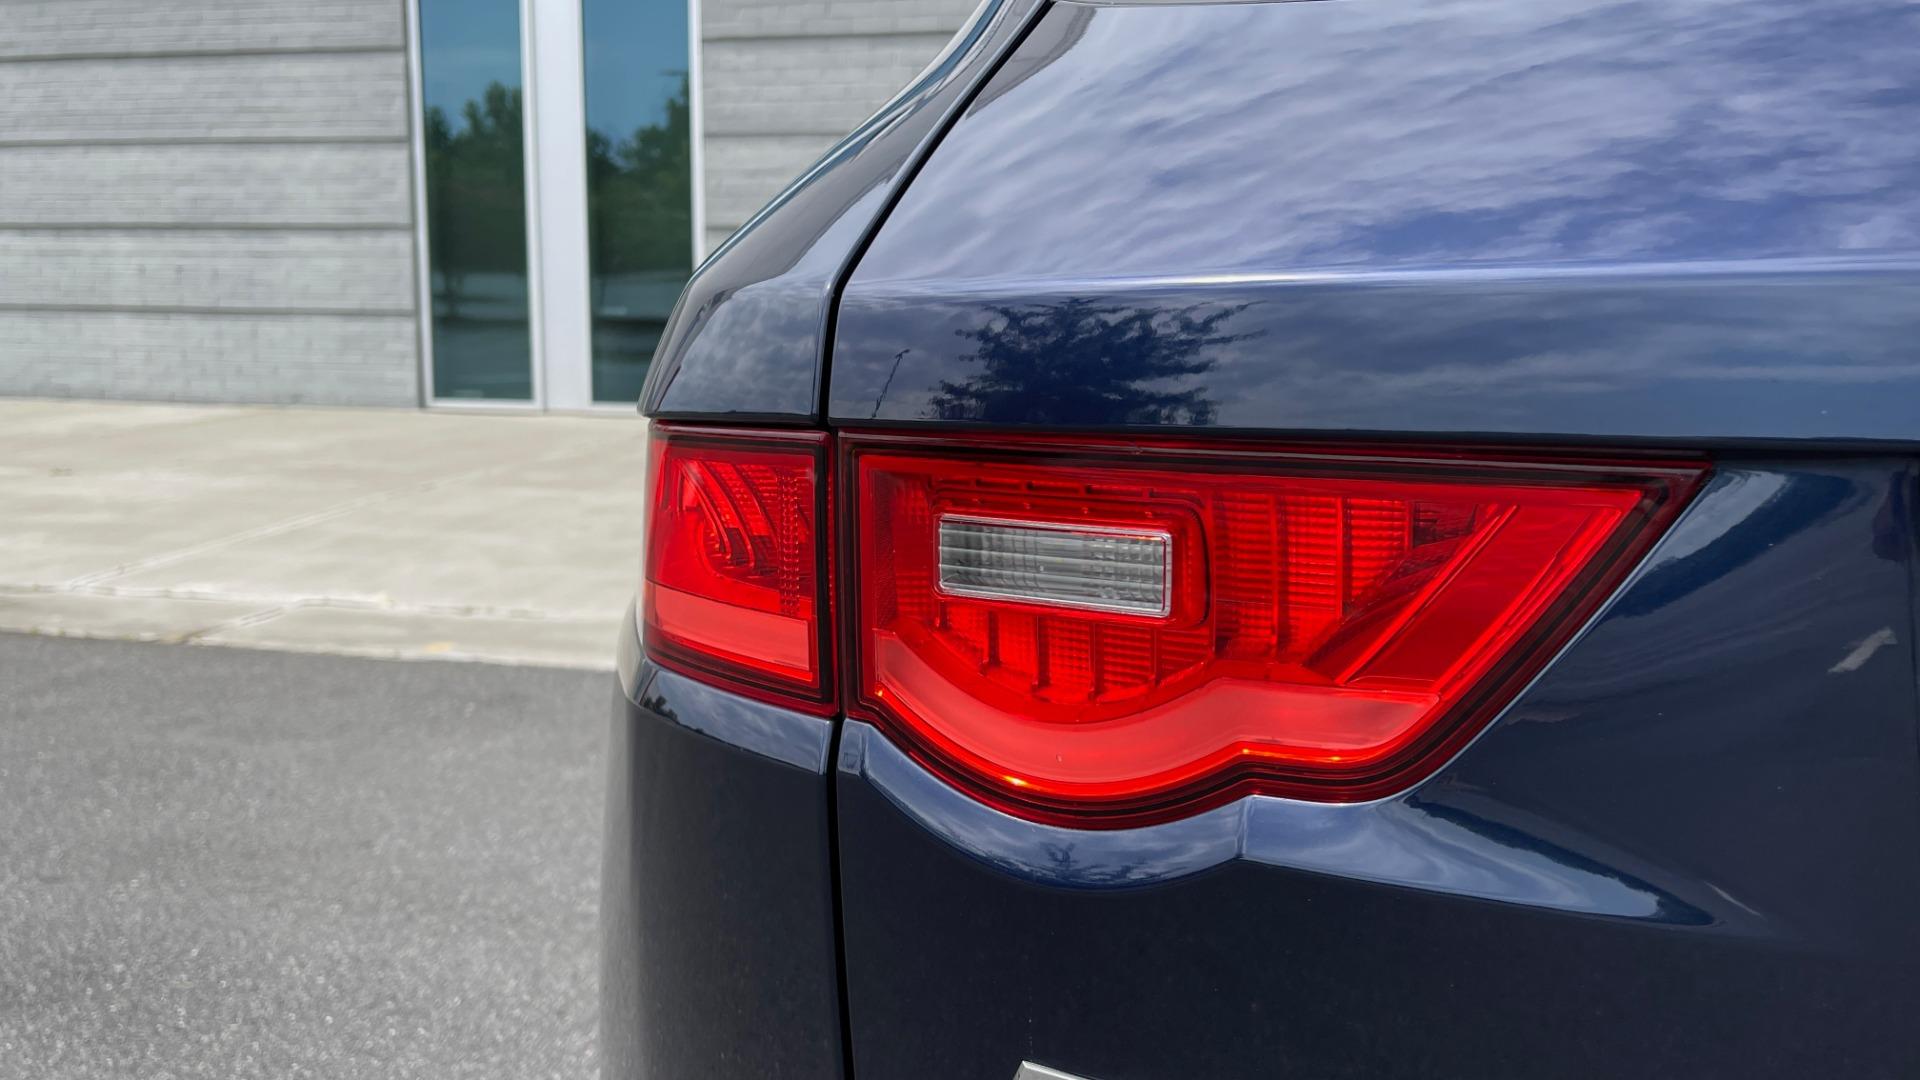 Used 2019 Jaguar F-PACE S / DRIVE PKG / BSA / HUD / BLACK EXT PKG / REARVIEW for sale $50,995 at Formula Imports in Charlotte NC 28227 23